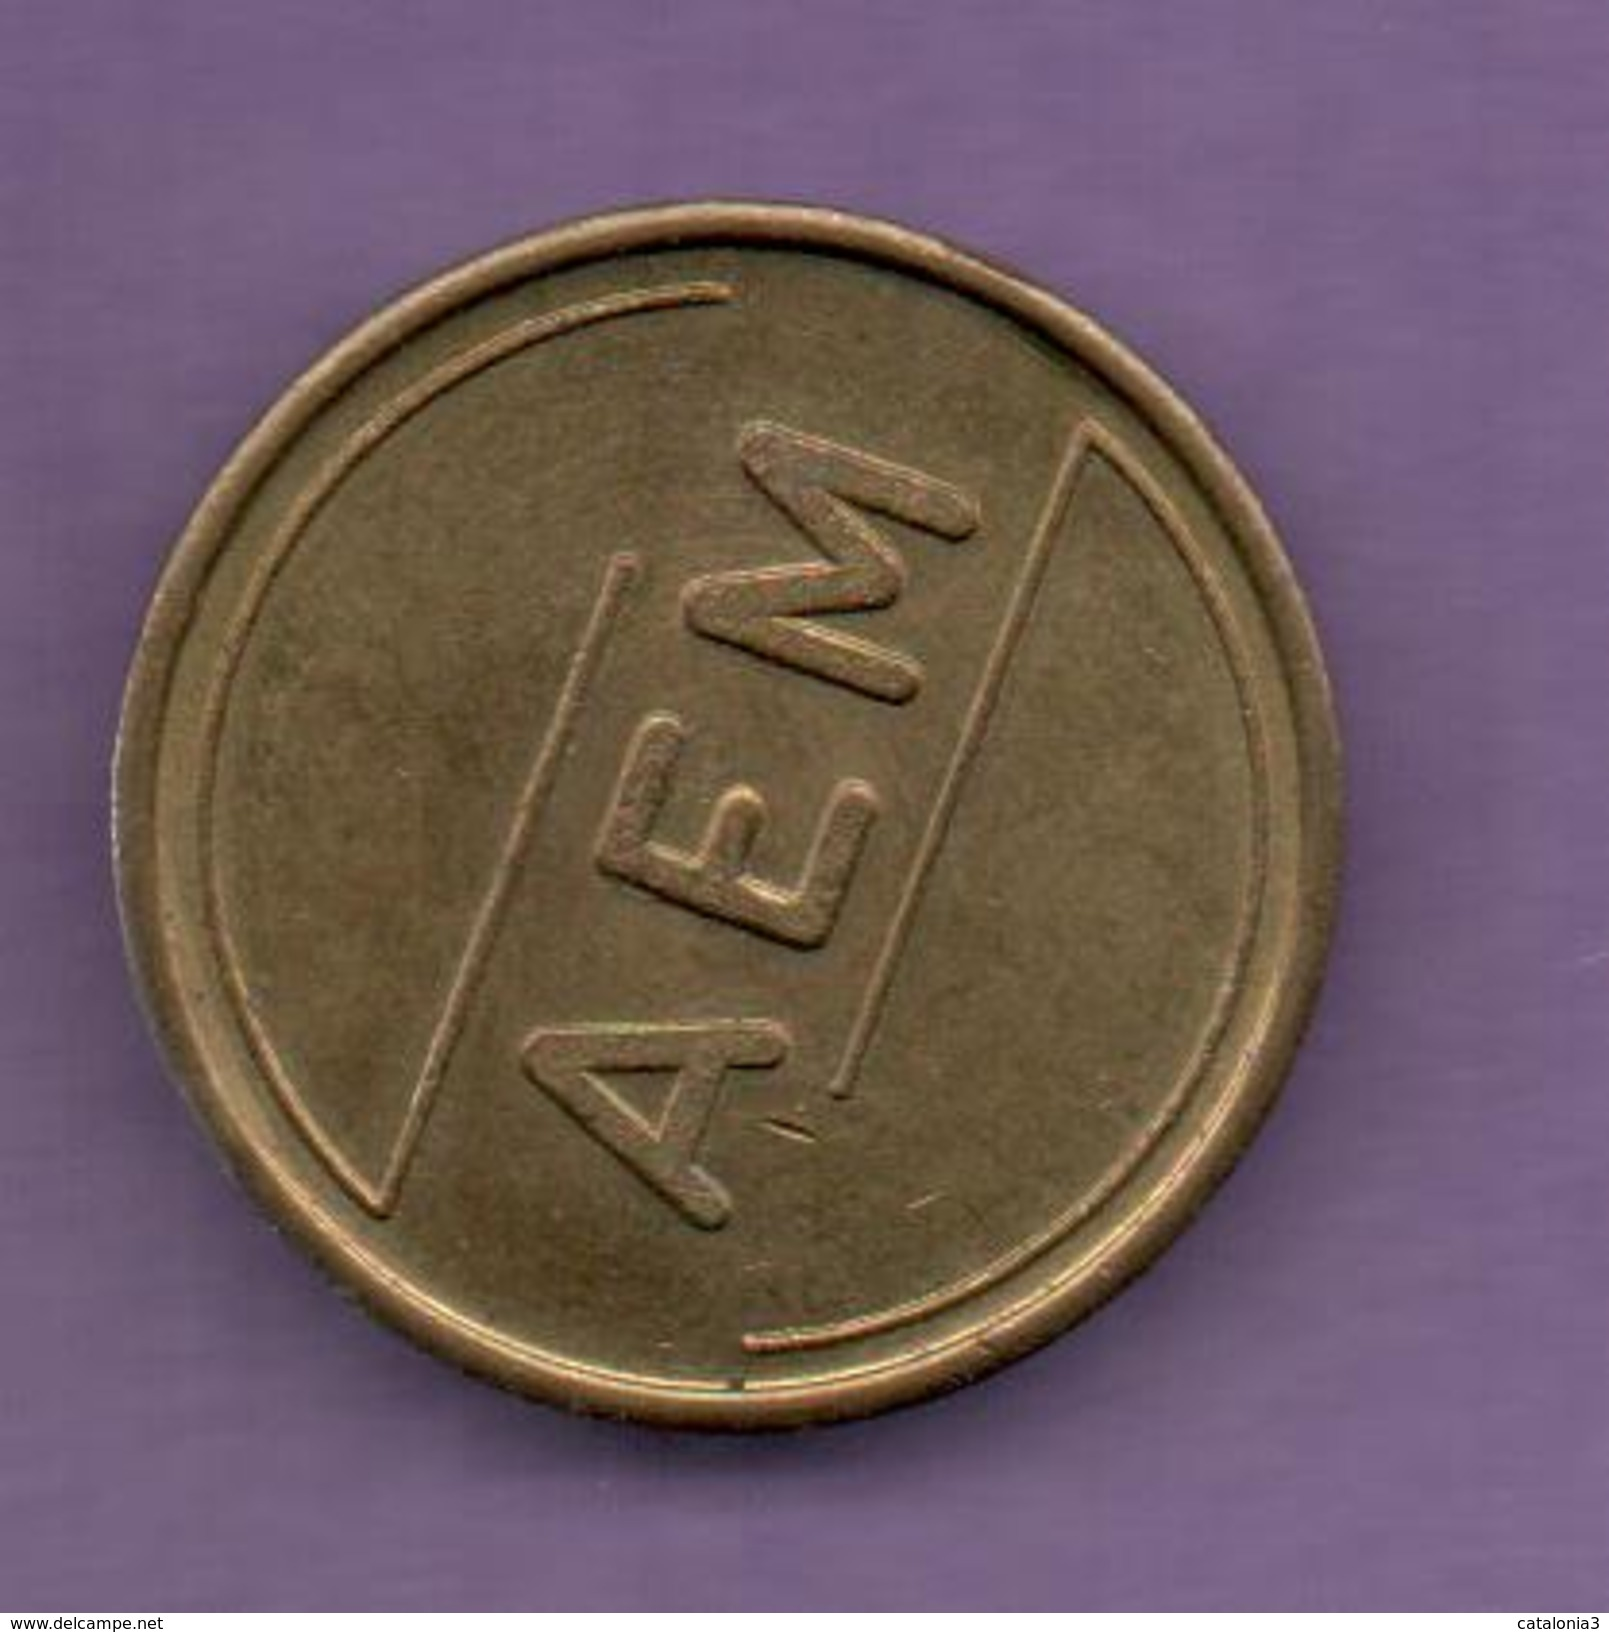 FICHAS - MEDALLAS // Token - Medal - A E M  (1) - Allemagne